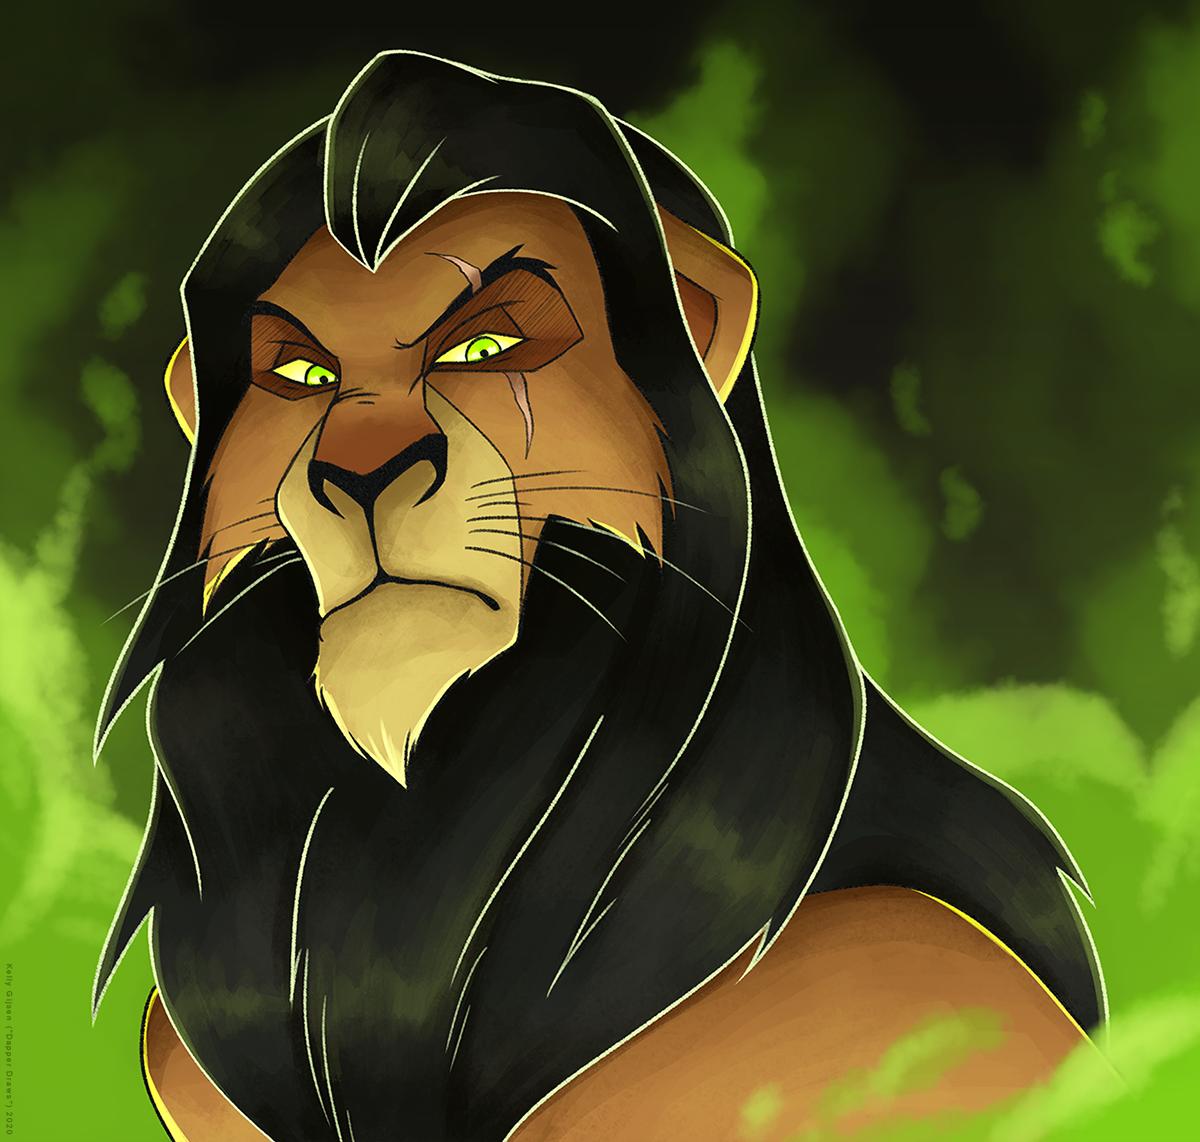 """Be Prepared"" - Scar, the best Disney Villain! (to me, haha) - #disney #lionking #lion #king #thelionking #scar #villain #art #illustration #dapperdraws #simba #mufasa #nala #digital #digitalart #lion #animal #movie #childhood https://t.co/RfhyTb1GD0"